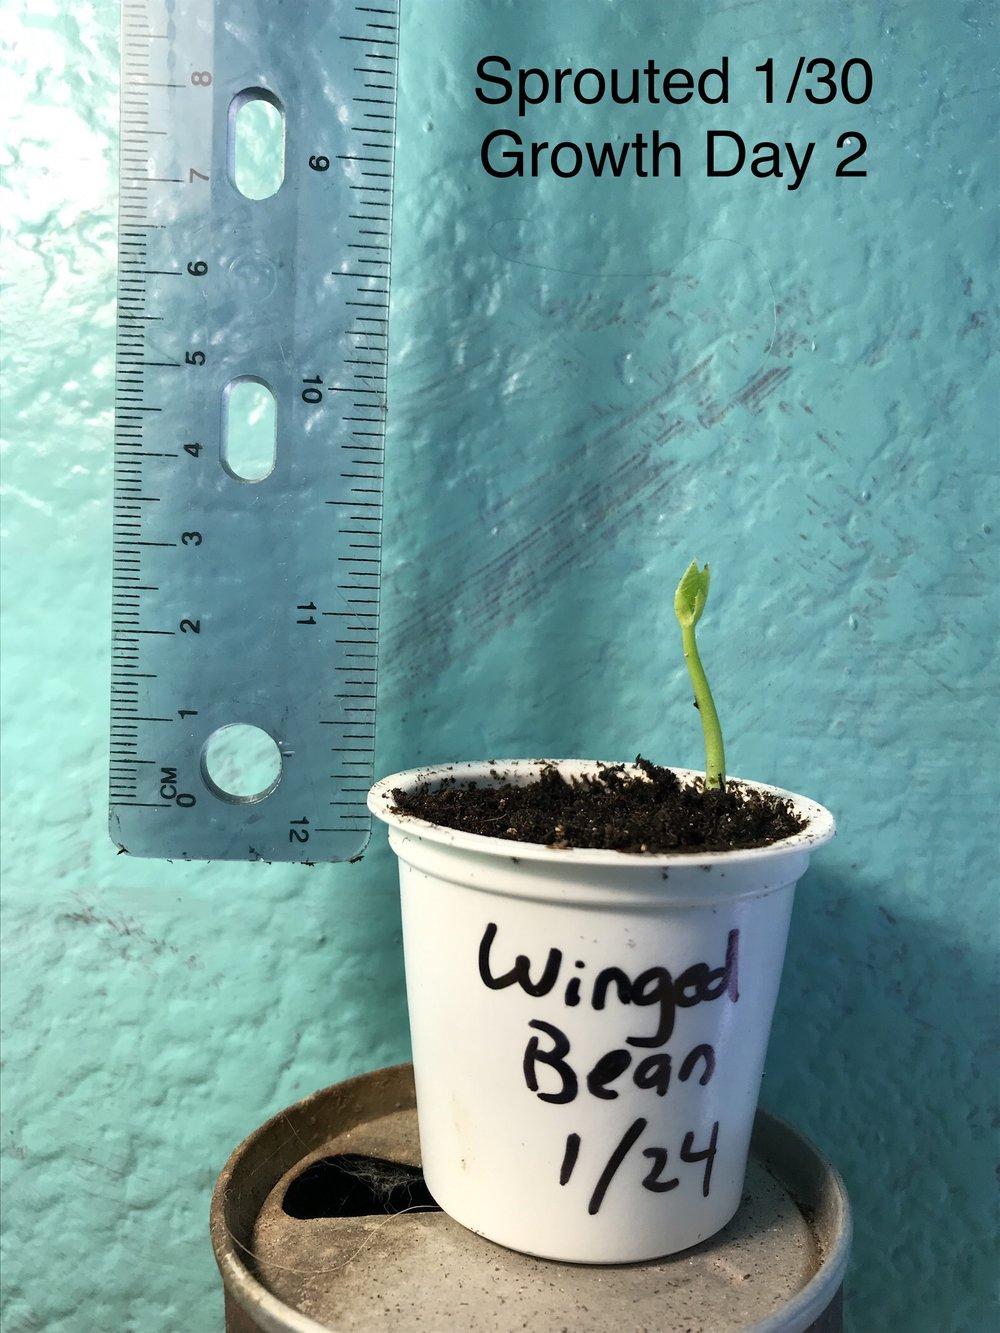 Winged Bean.jpg